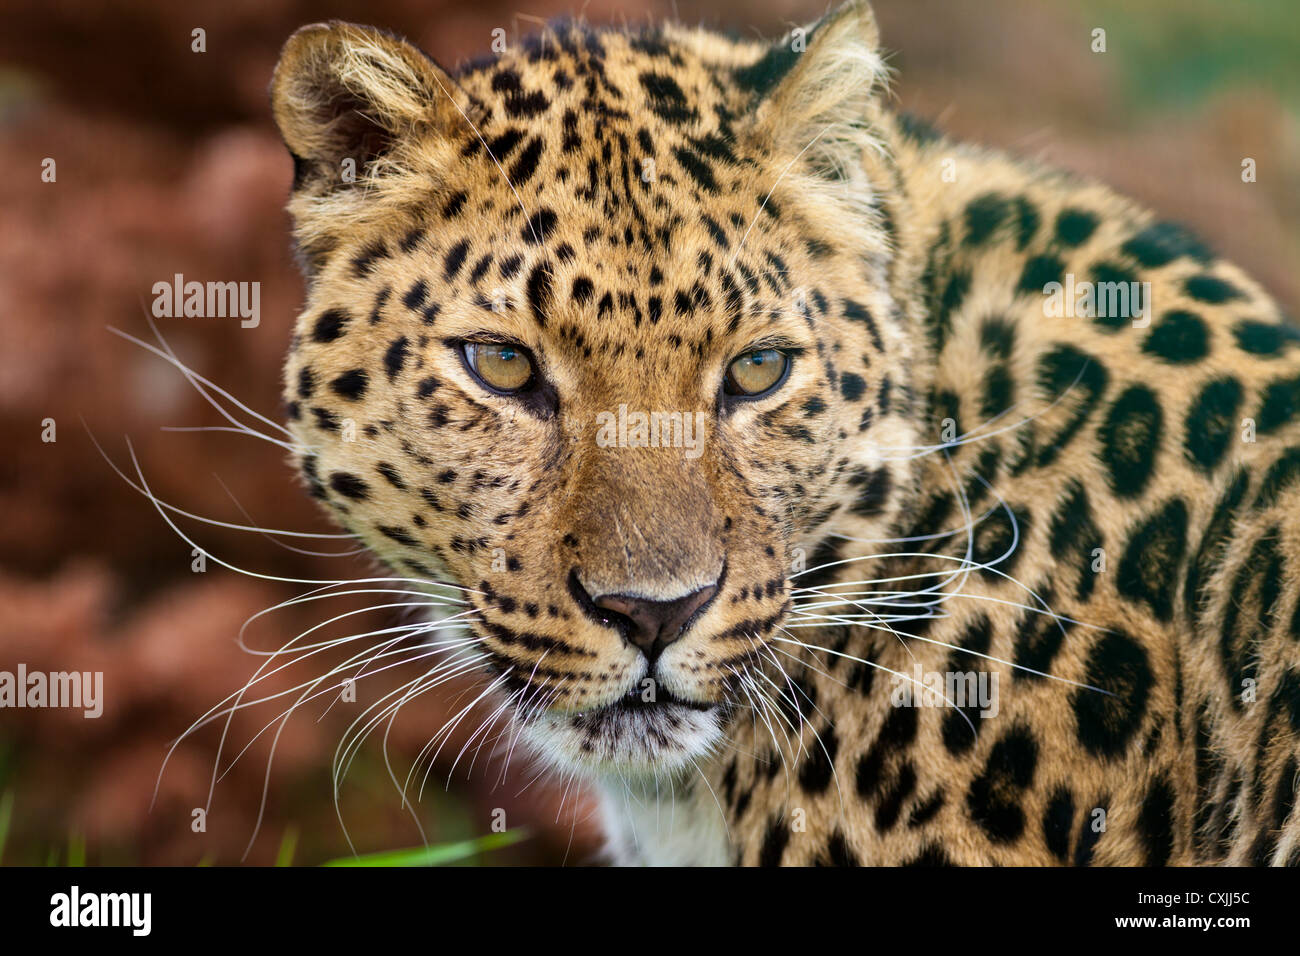 Amur leopard (Panthera pardus) - Stock Image